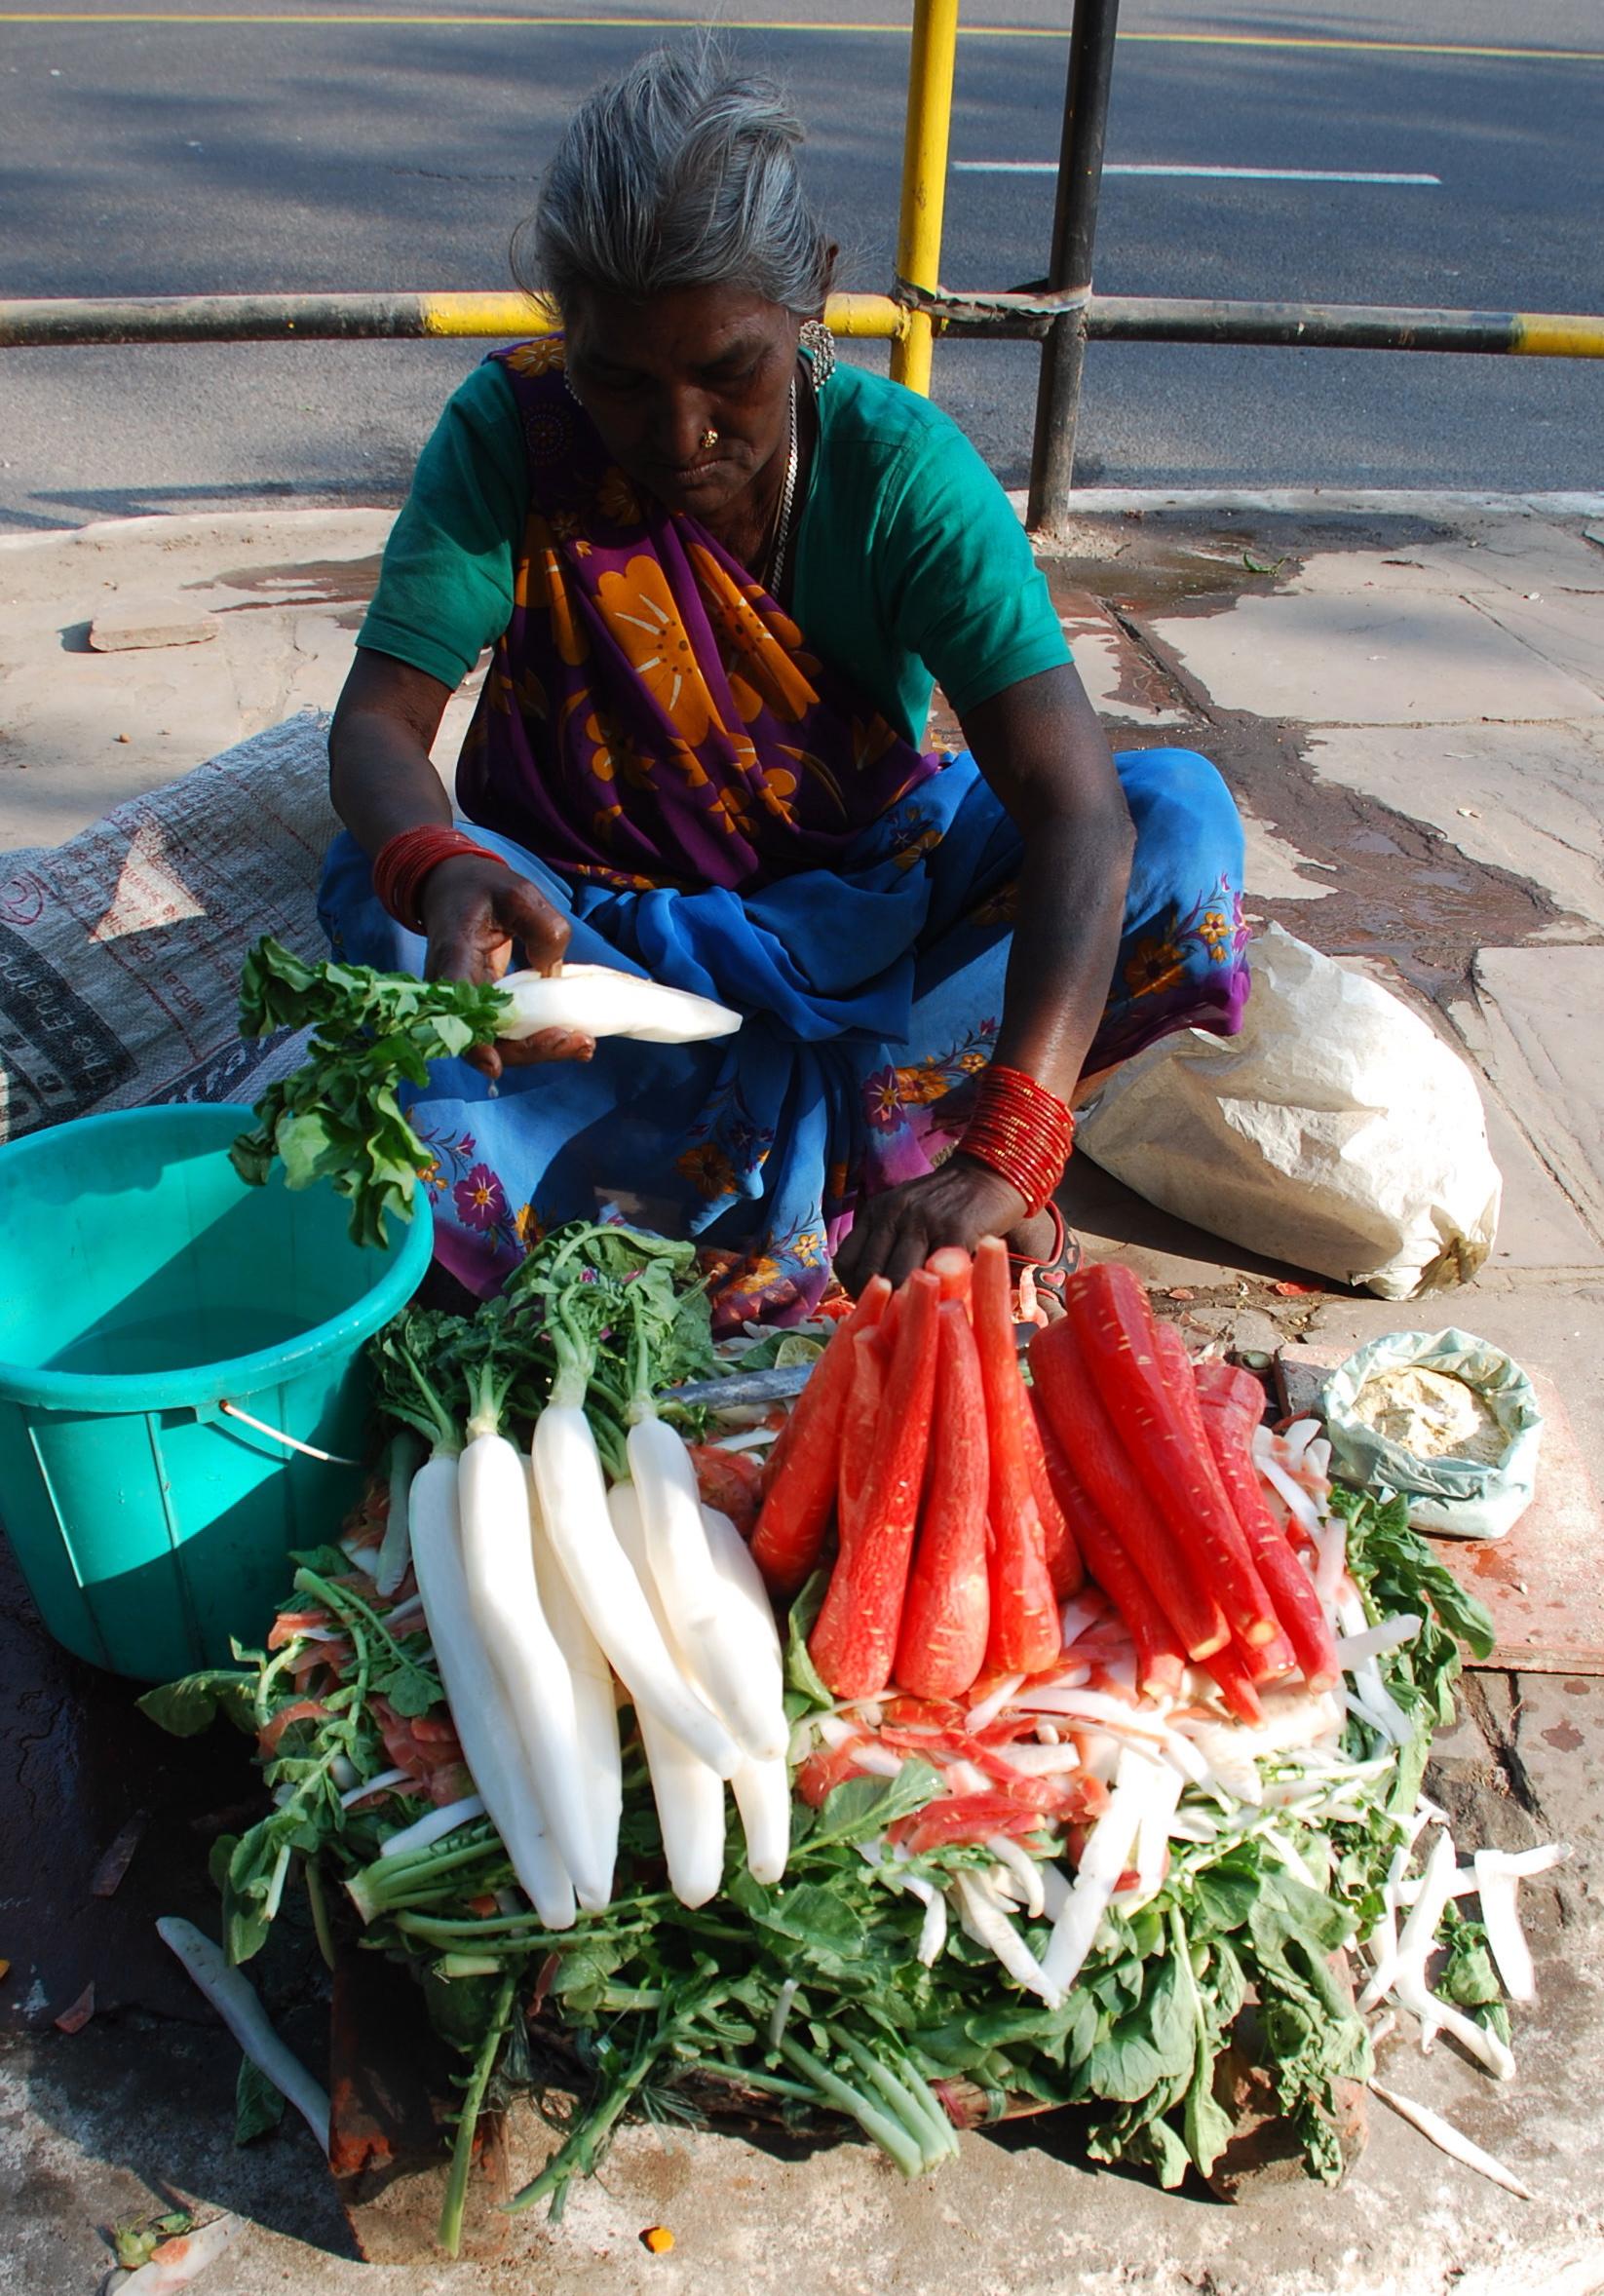 Radish and Carrot Street Food Vendor in Delhi